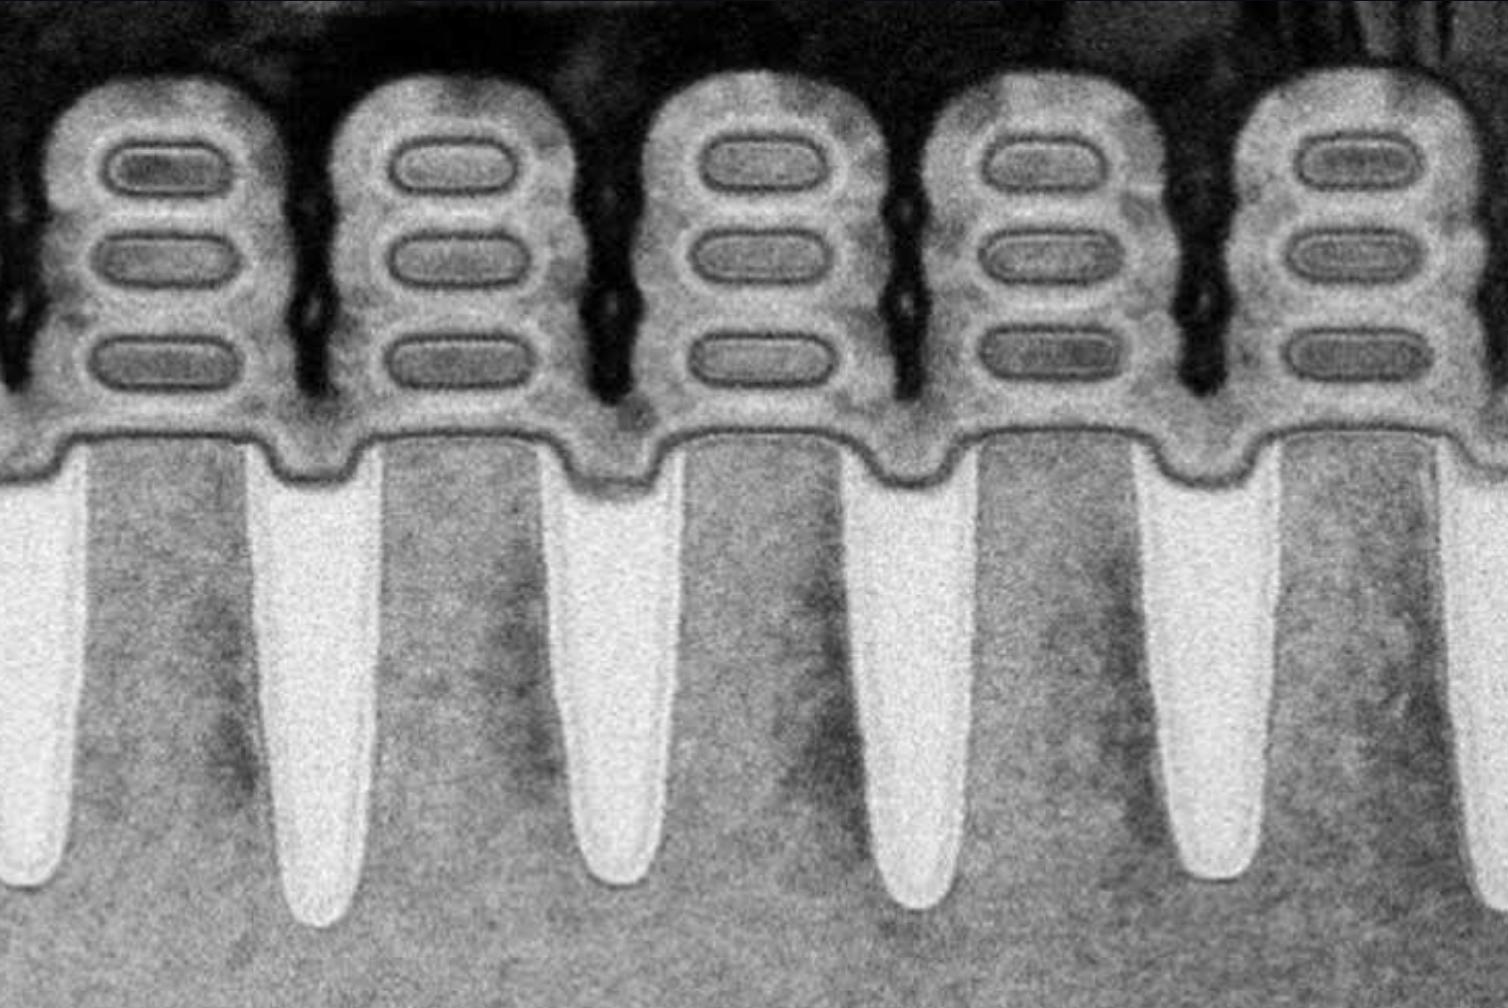 Semiconductor Engineering - 5nm Design Progress